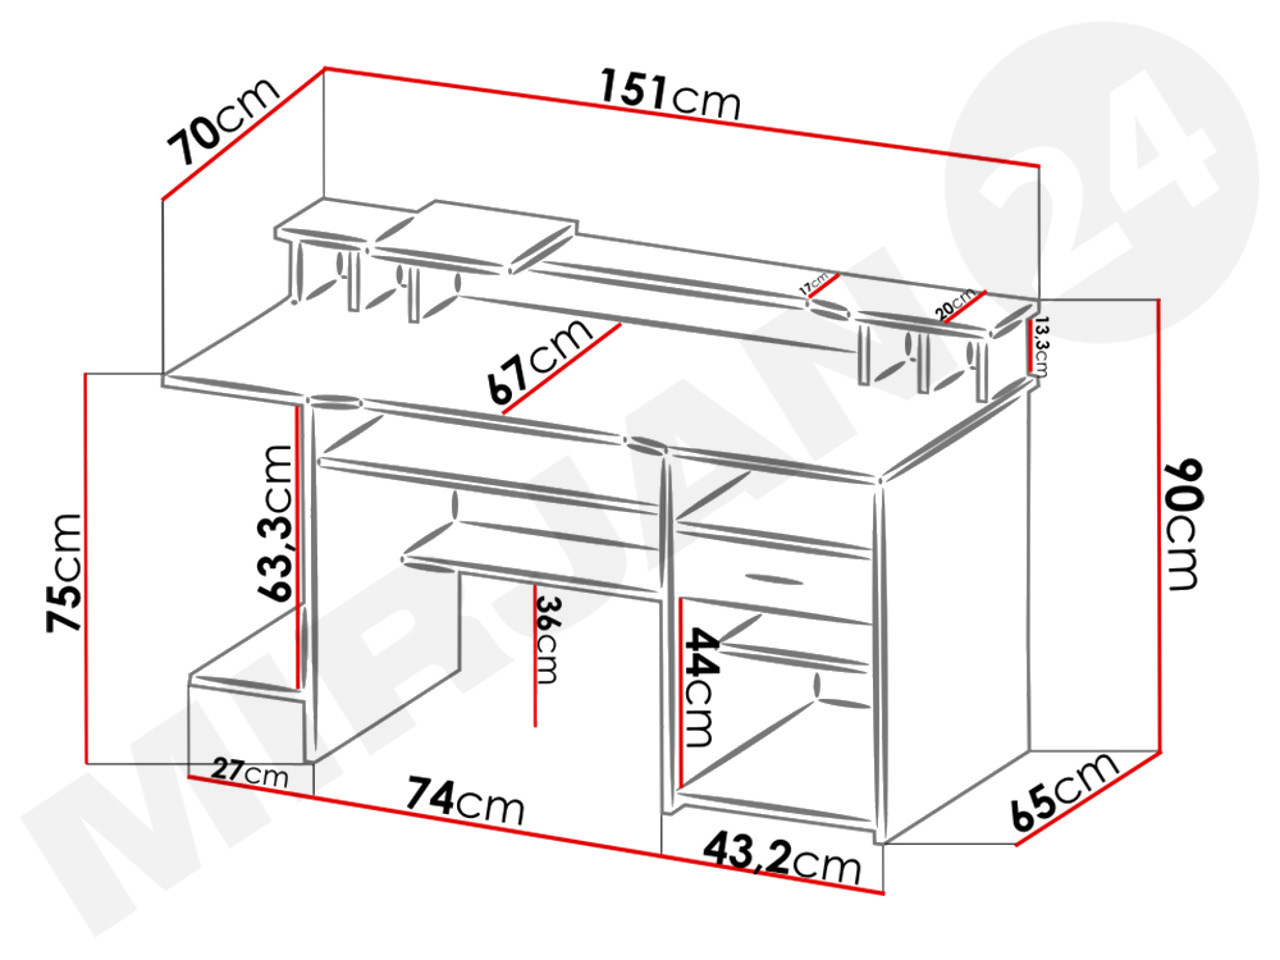 biurka/p4/p4_w.jpg